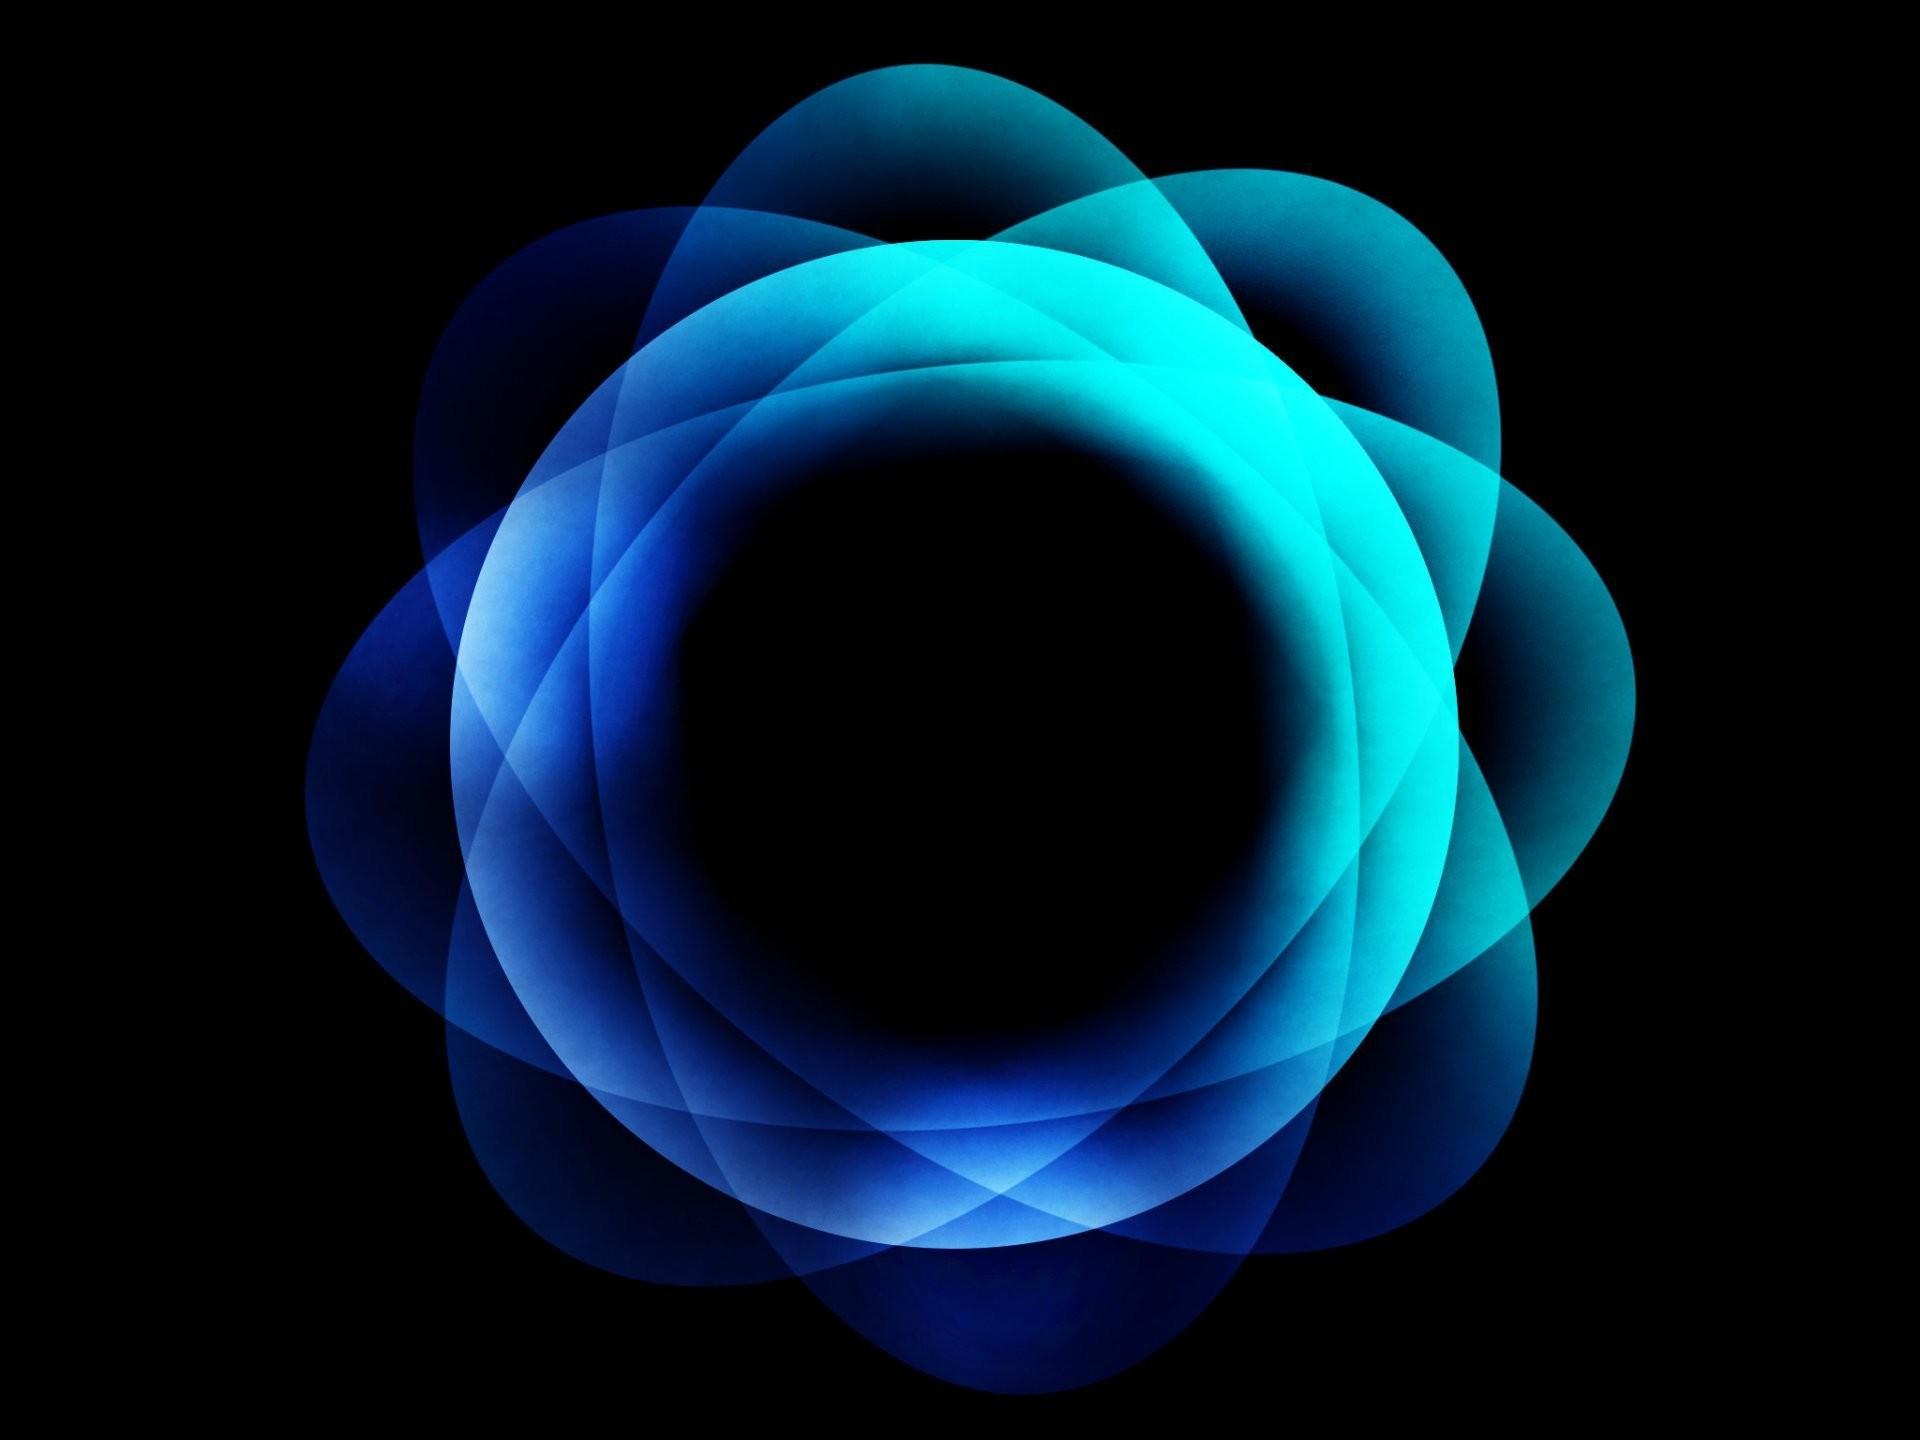 strange blue circle abstract pattern blue blue gimp gimp flowers sun